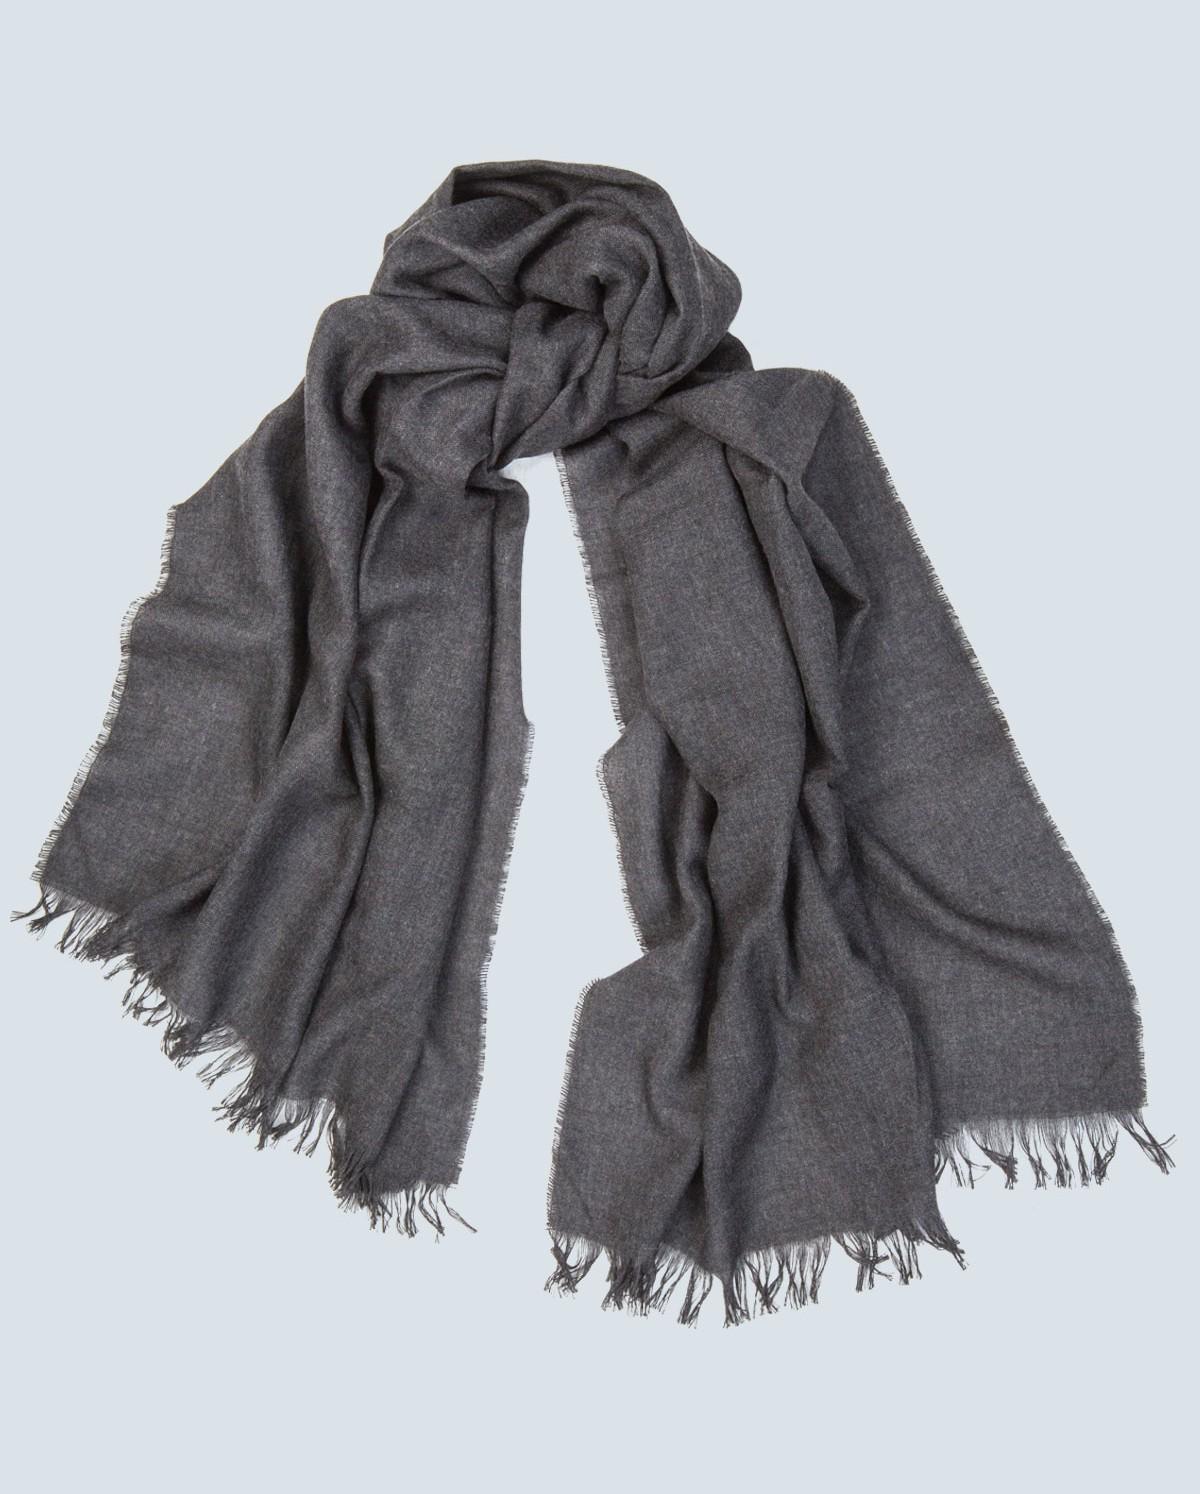 kishorn lightweight cashmere scarf KEWARKE